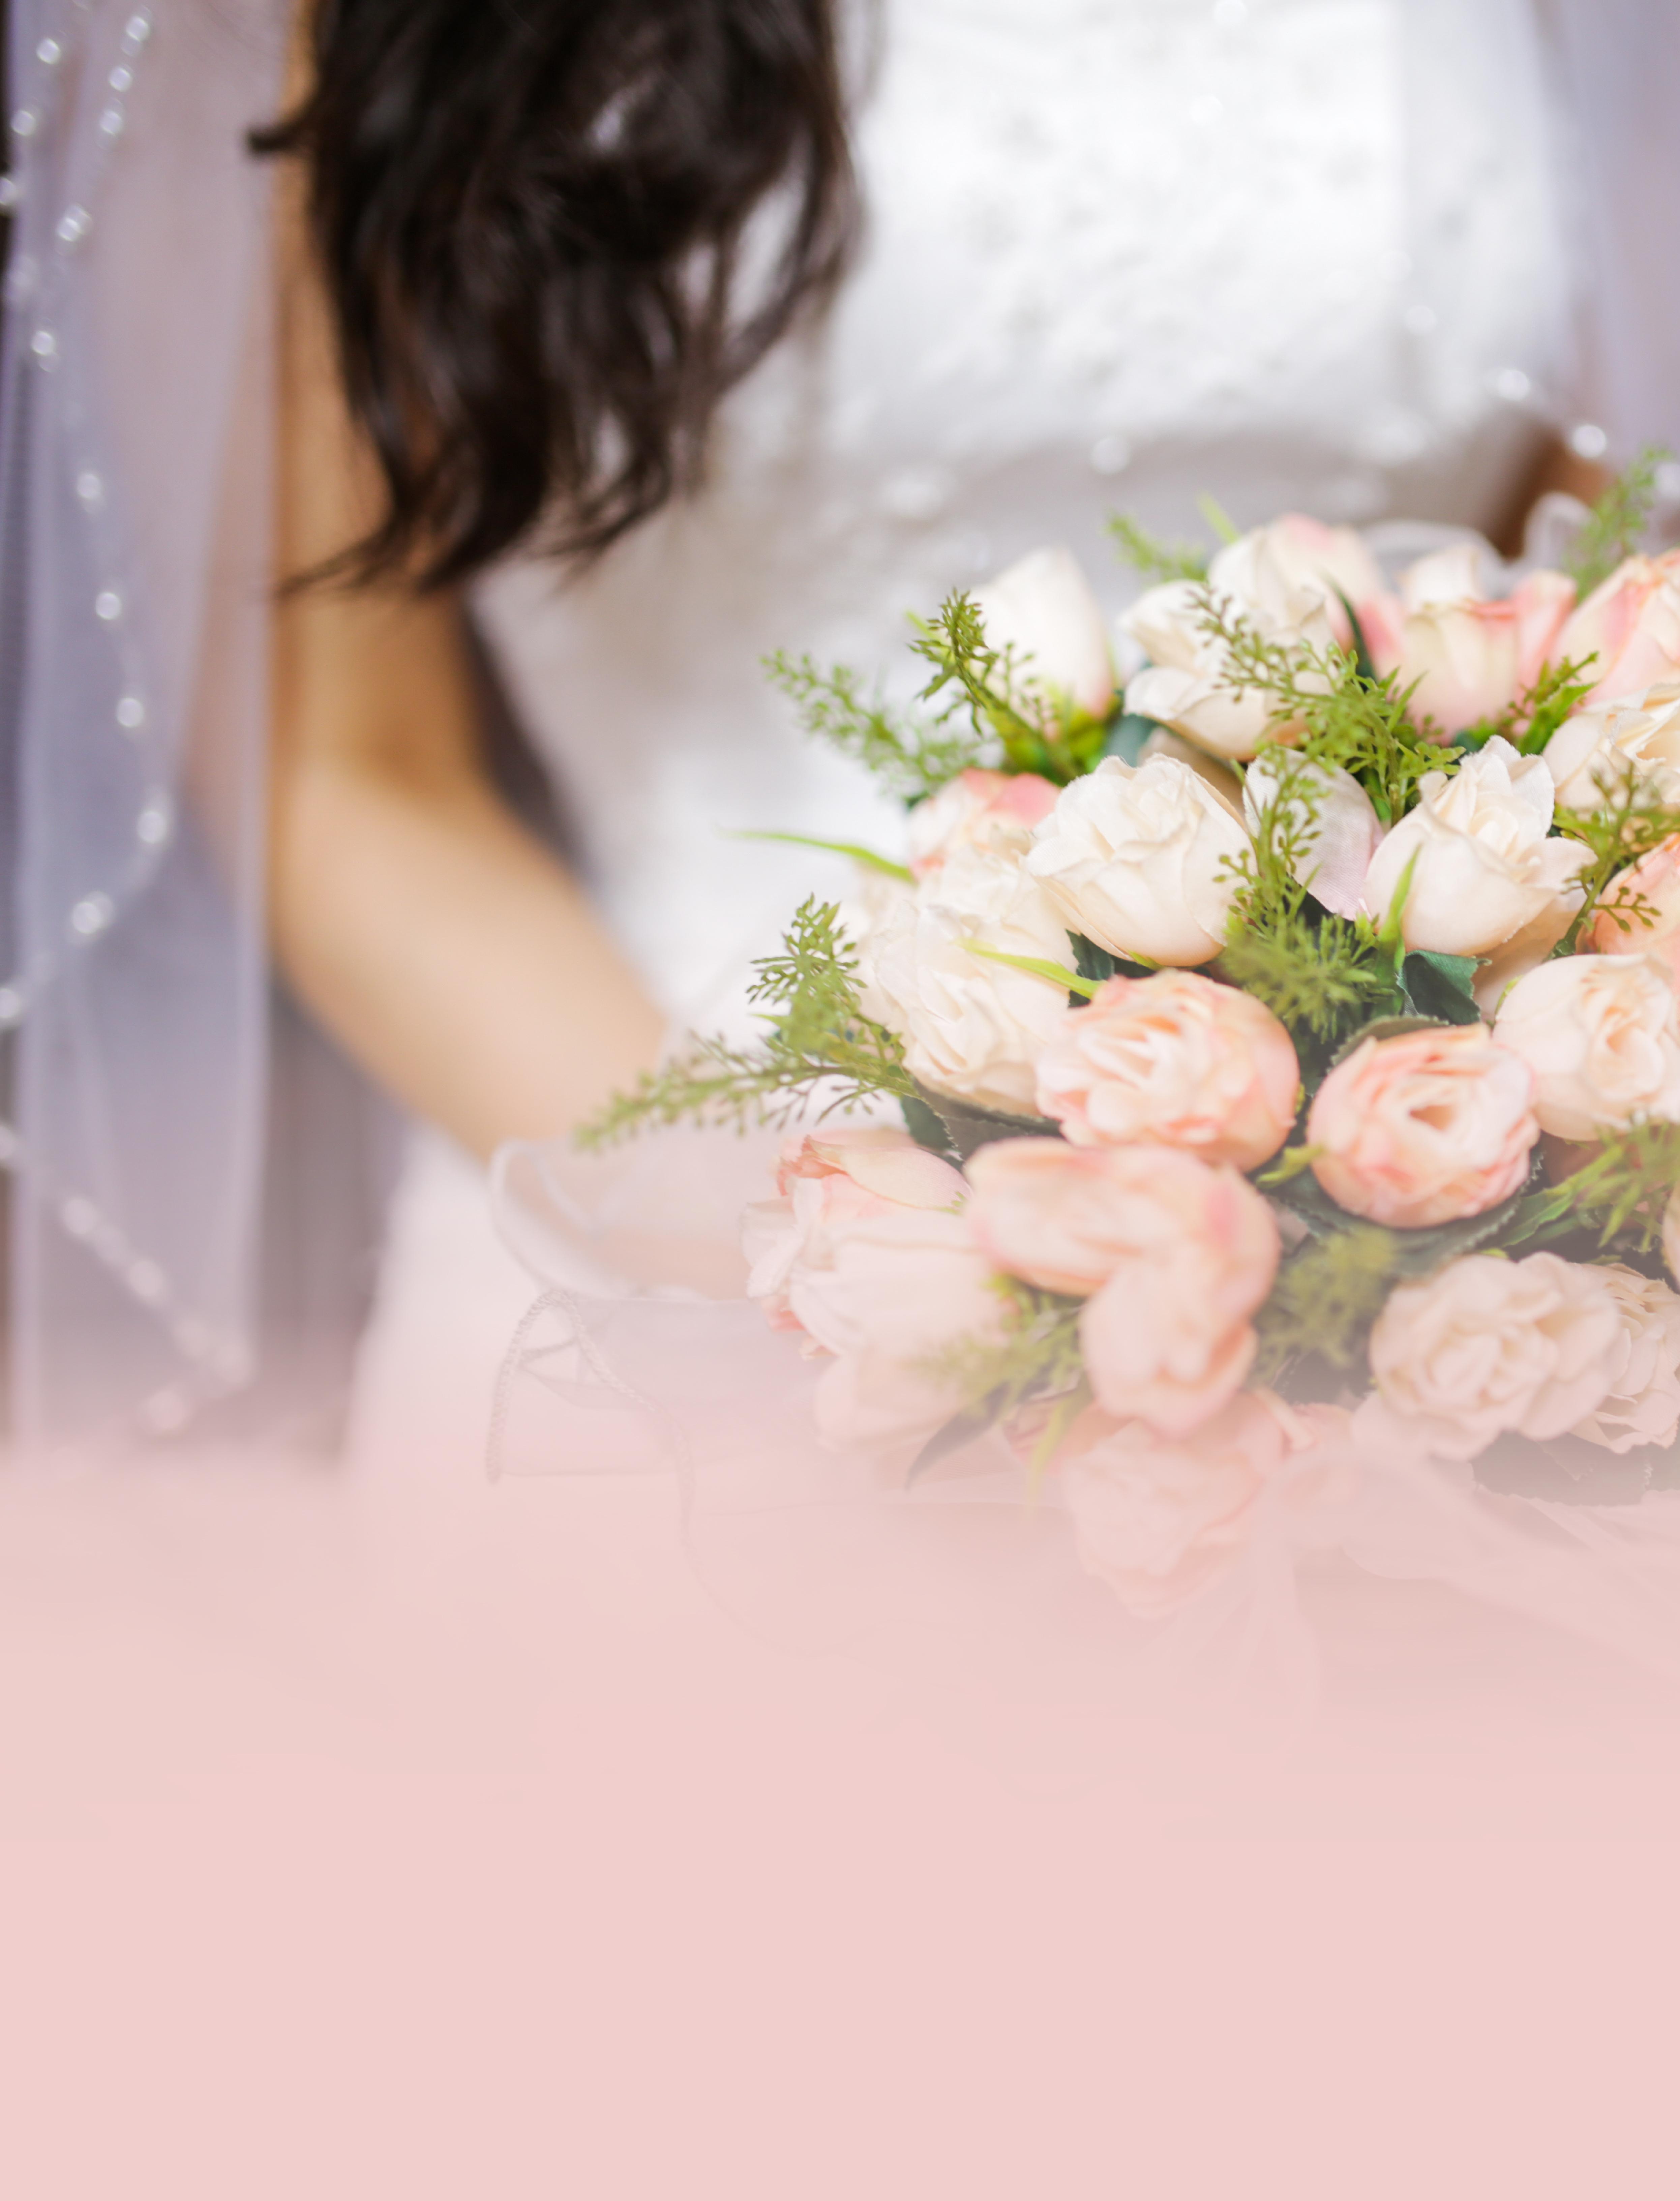 Buy artificial wedding bouquet faux flower bouquet for weddings